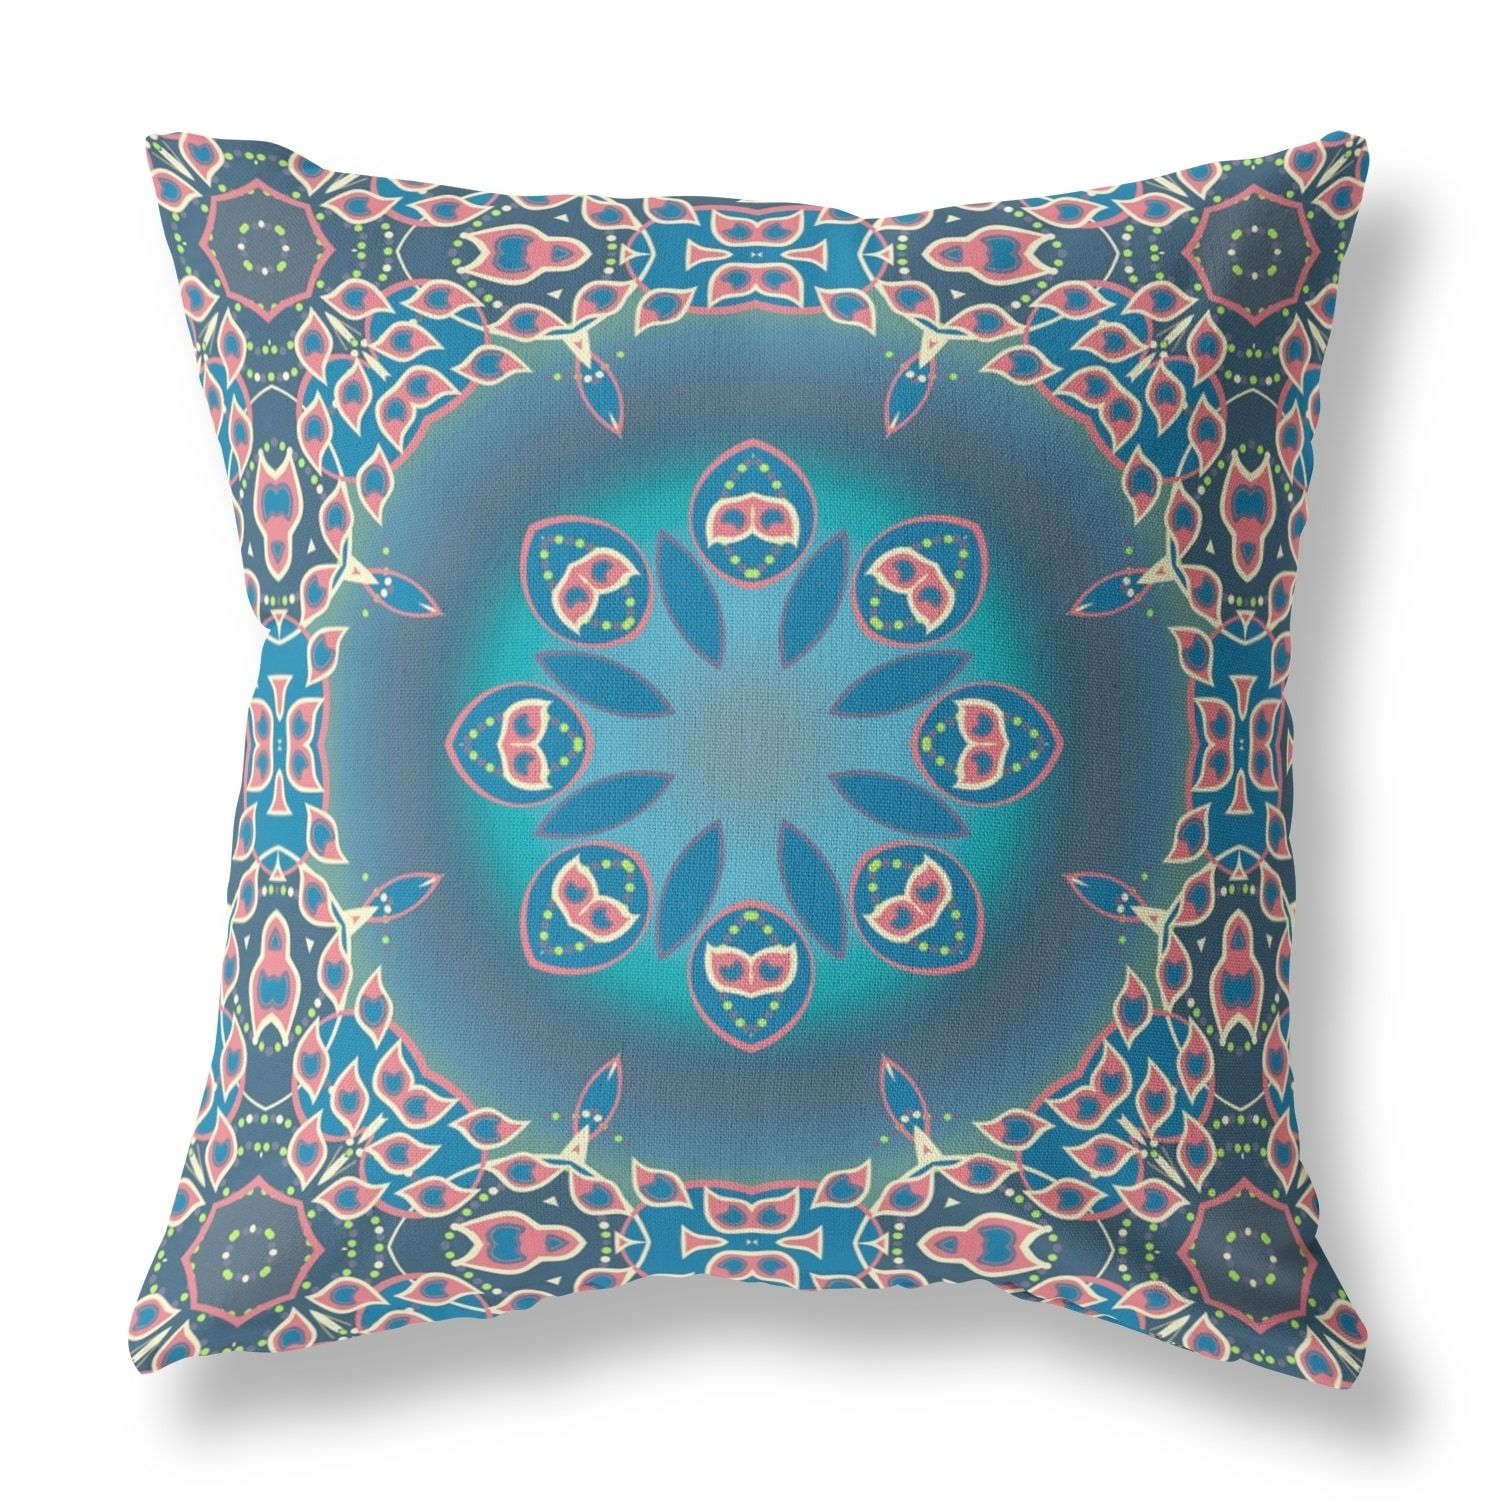 Circle of jewels broadcloth pillow by amrita sen